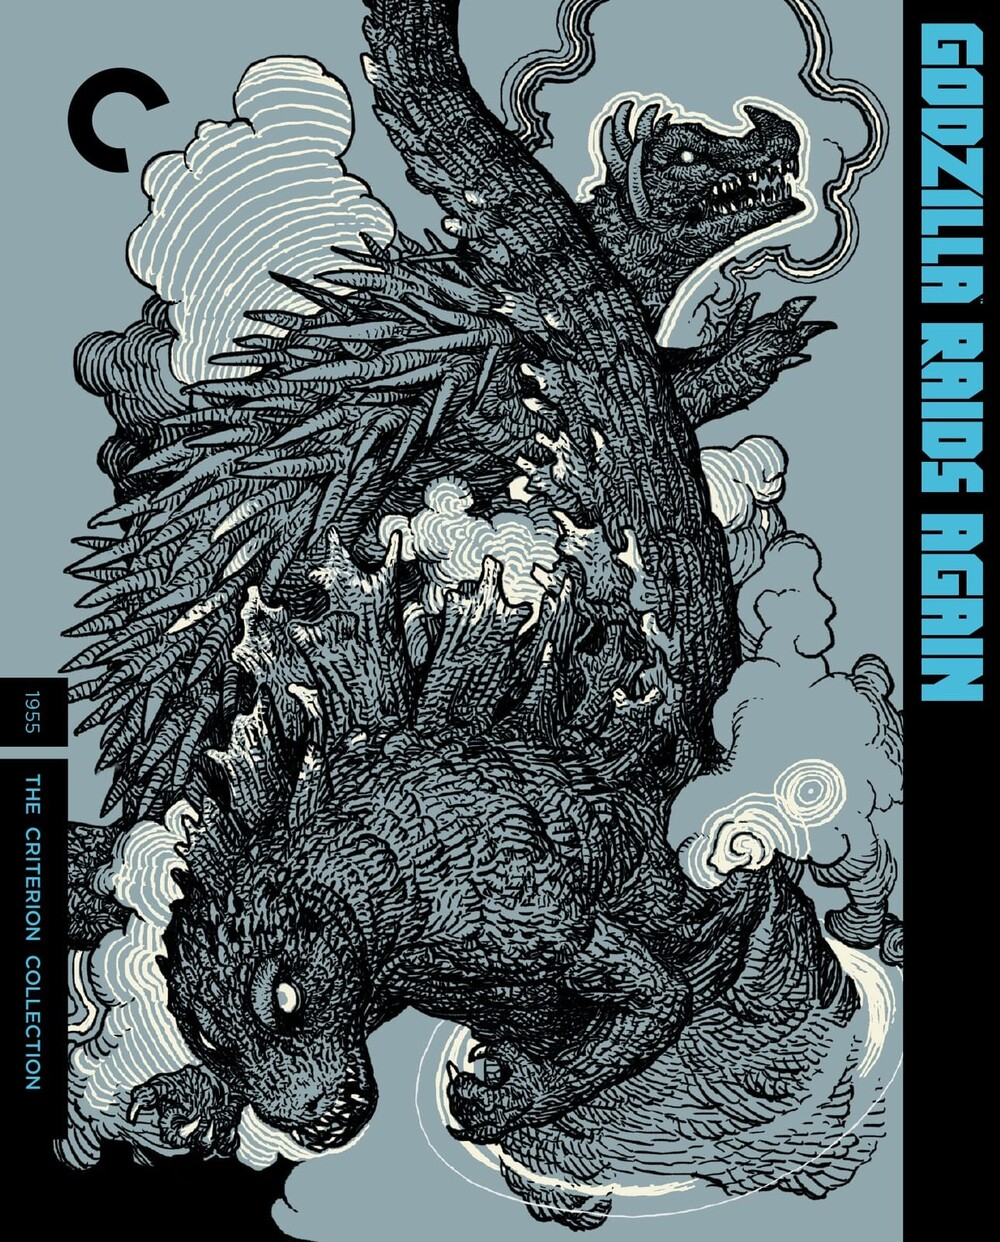 Gojira no gyakushû / Godzilla Raids Again (1955)